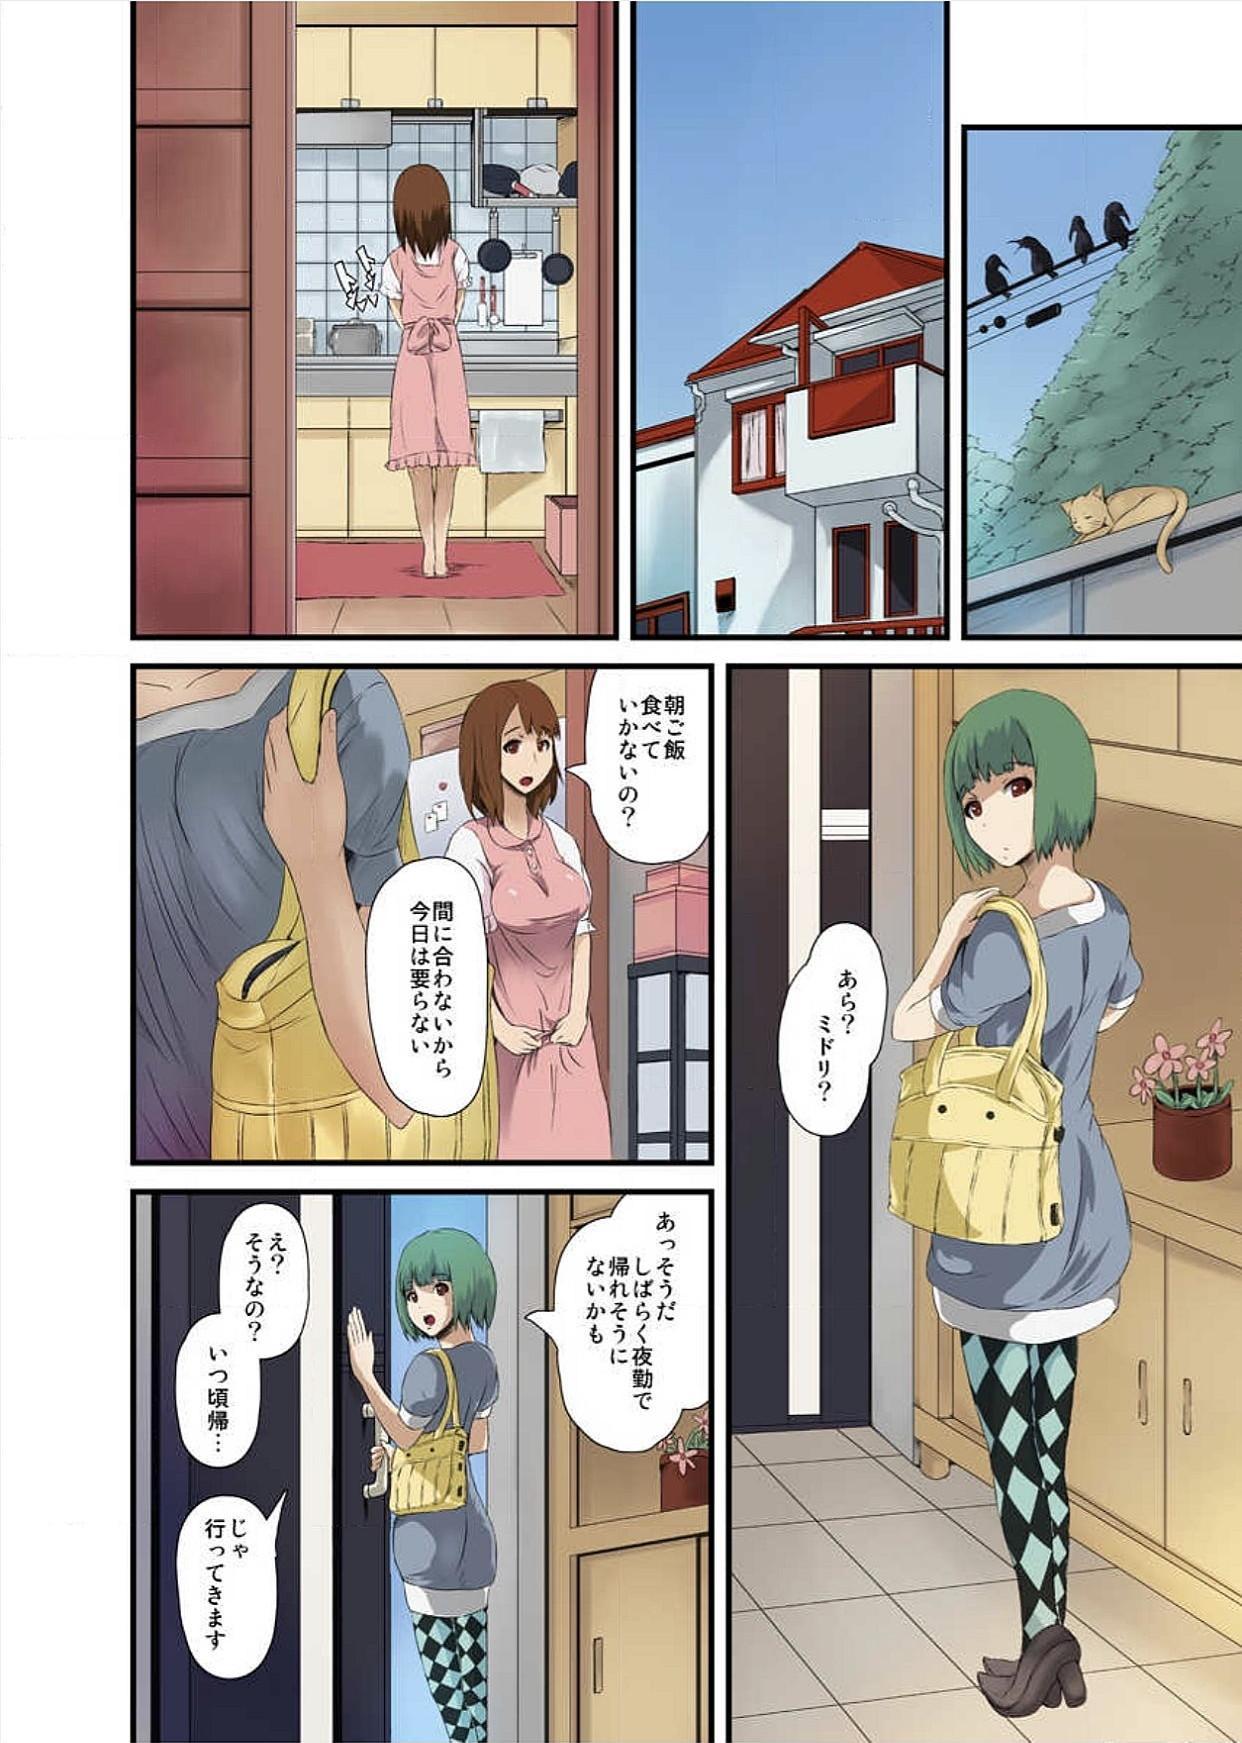 [Tomihero,] Shokushu Byoutou ~Itsuwari no Sanbujinka~ (Full Color) 【Tokusou Han】 [Digital] 39